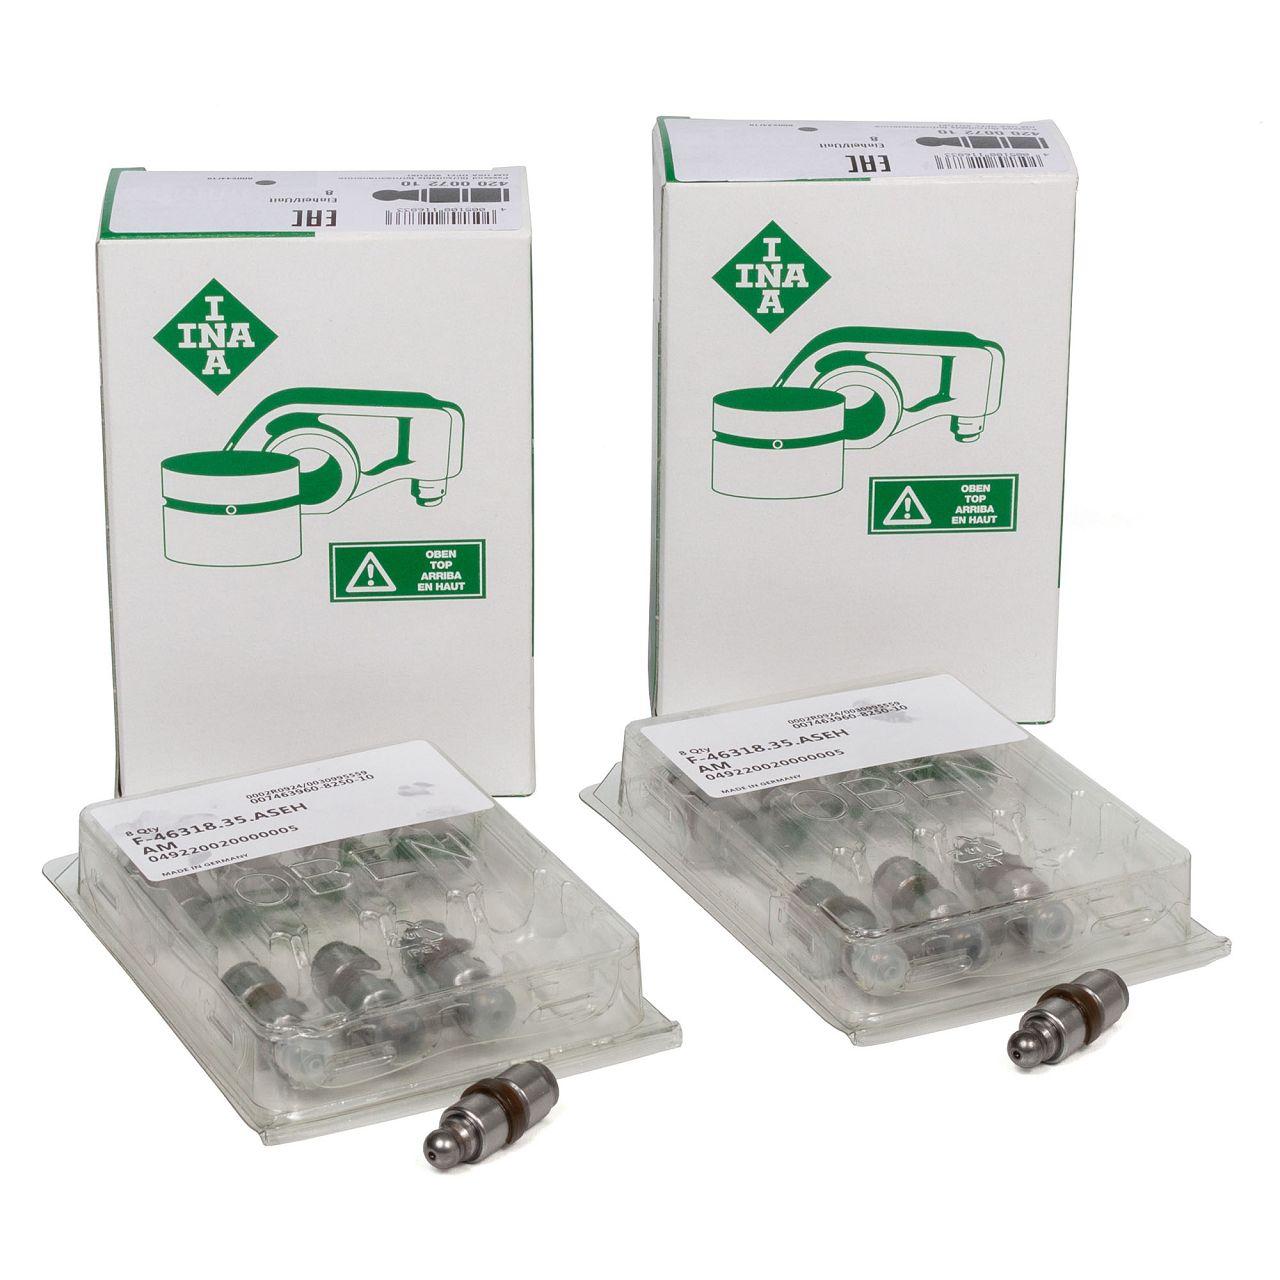 16x INA 420007210 Ventilstössel Hydrostössel CHEVROLET OPEL SUZUKI 1.0 1.2 1.4